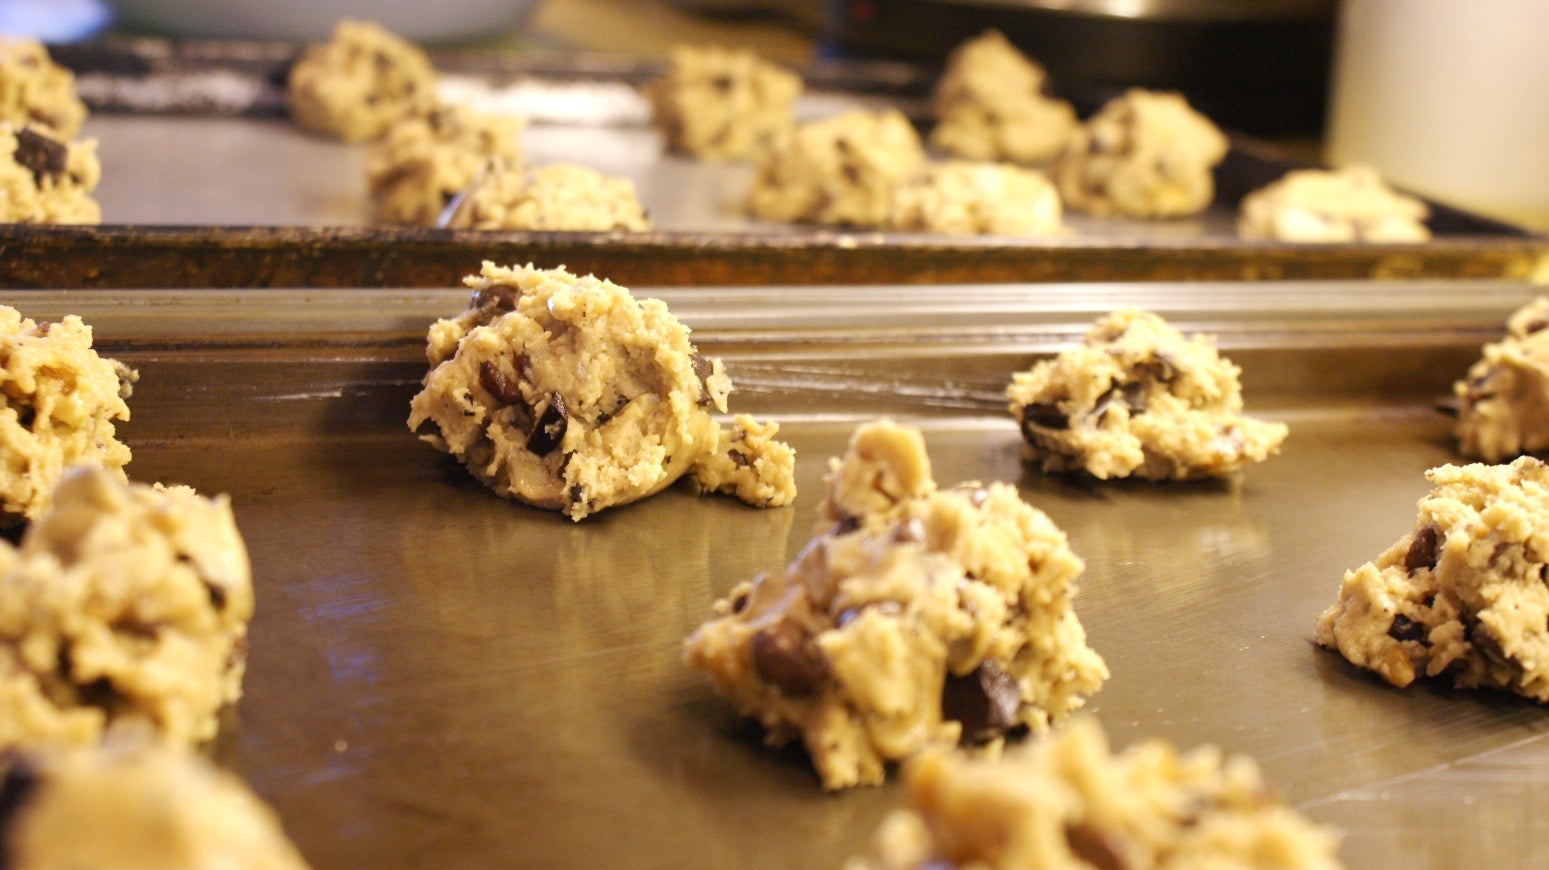 Yep, It's Still Not A Good Idea To Eat Raw Cookie Dough